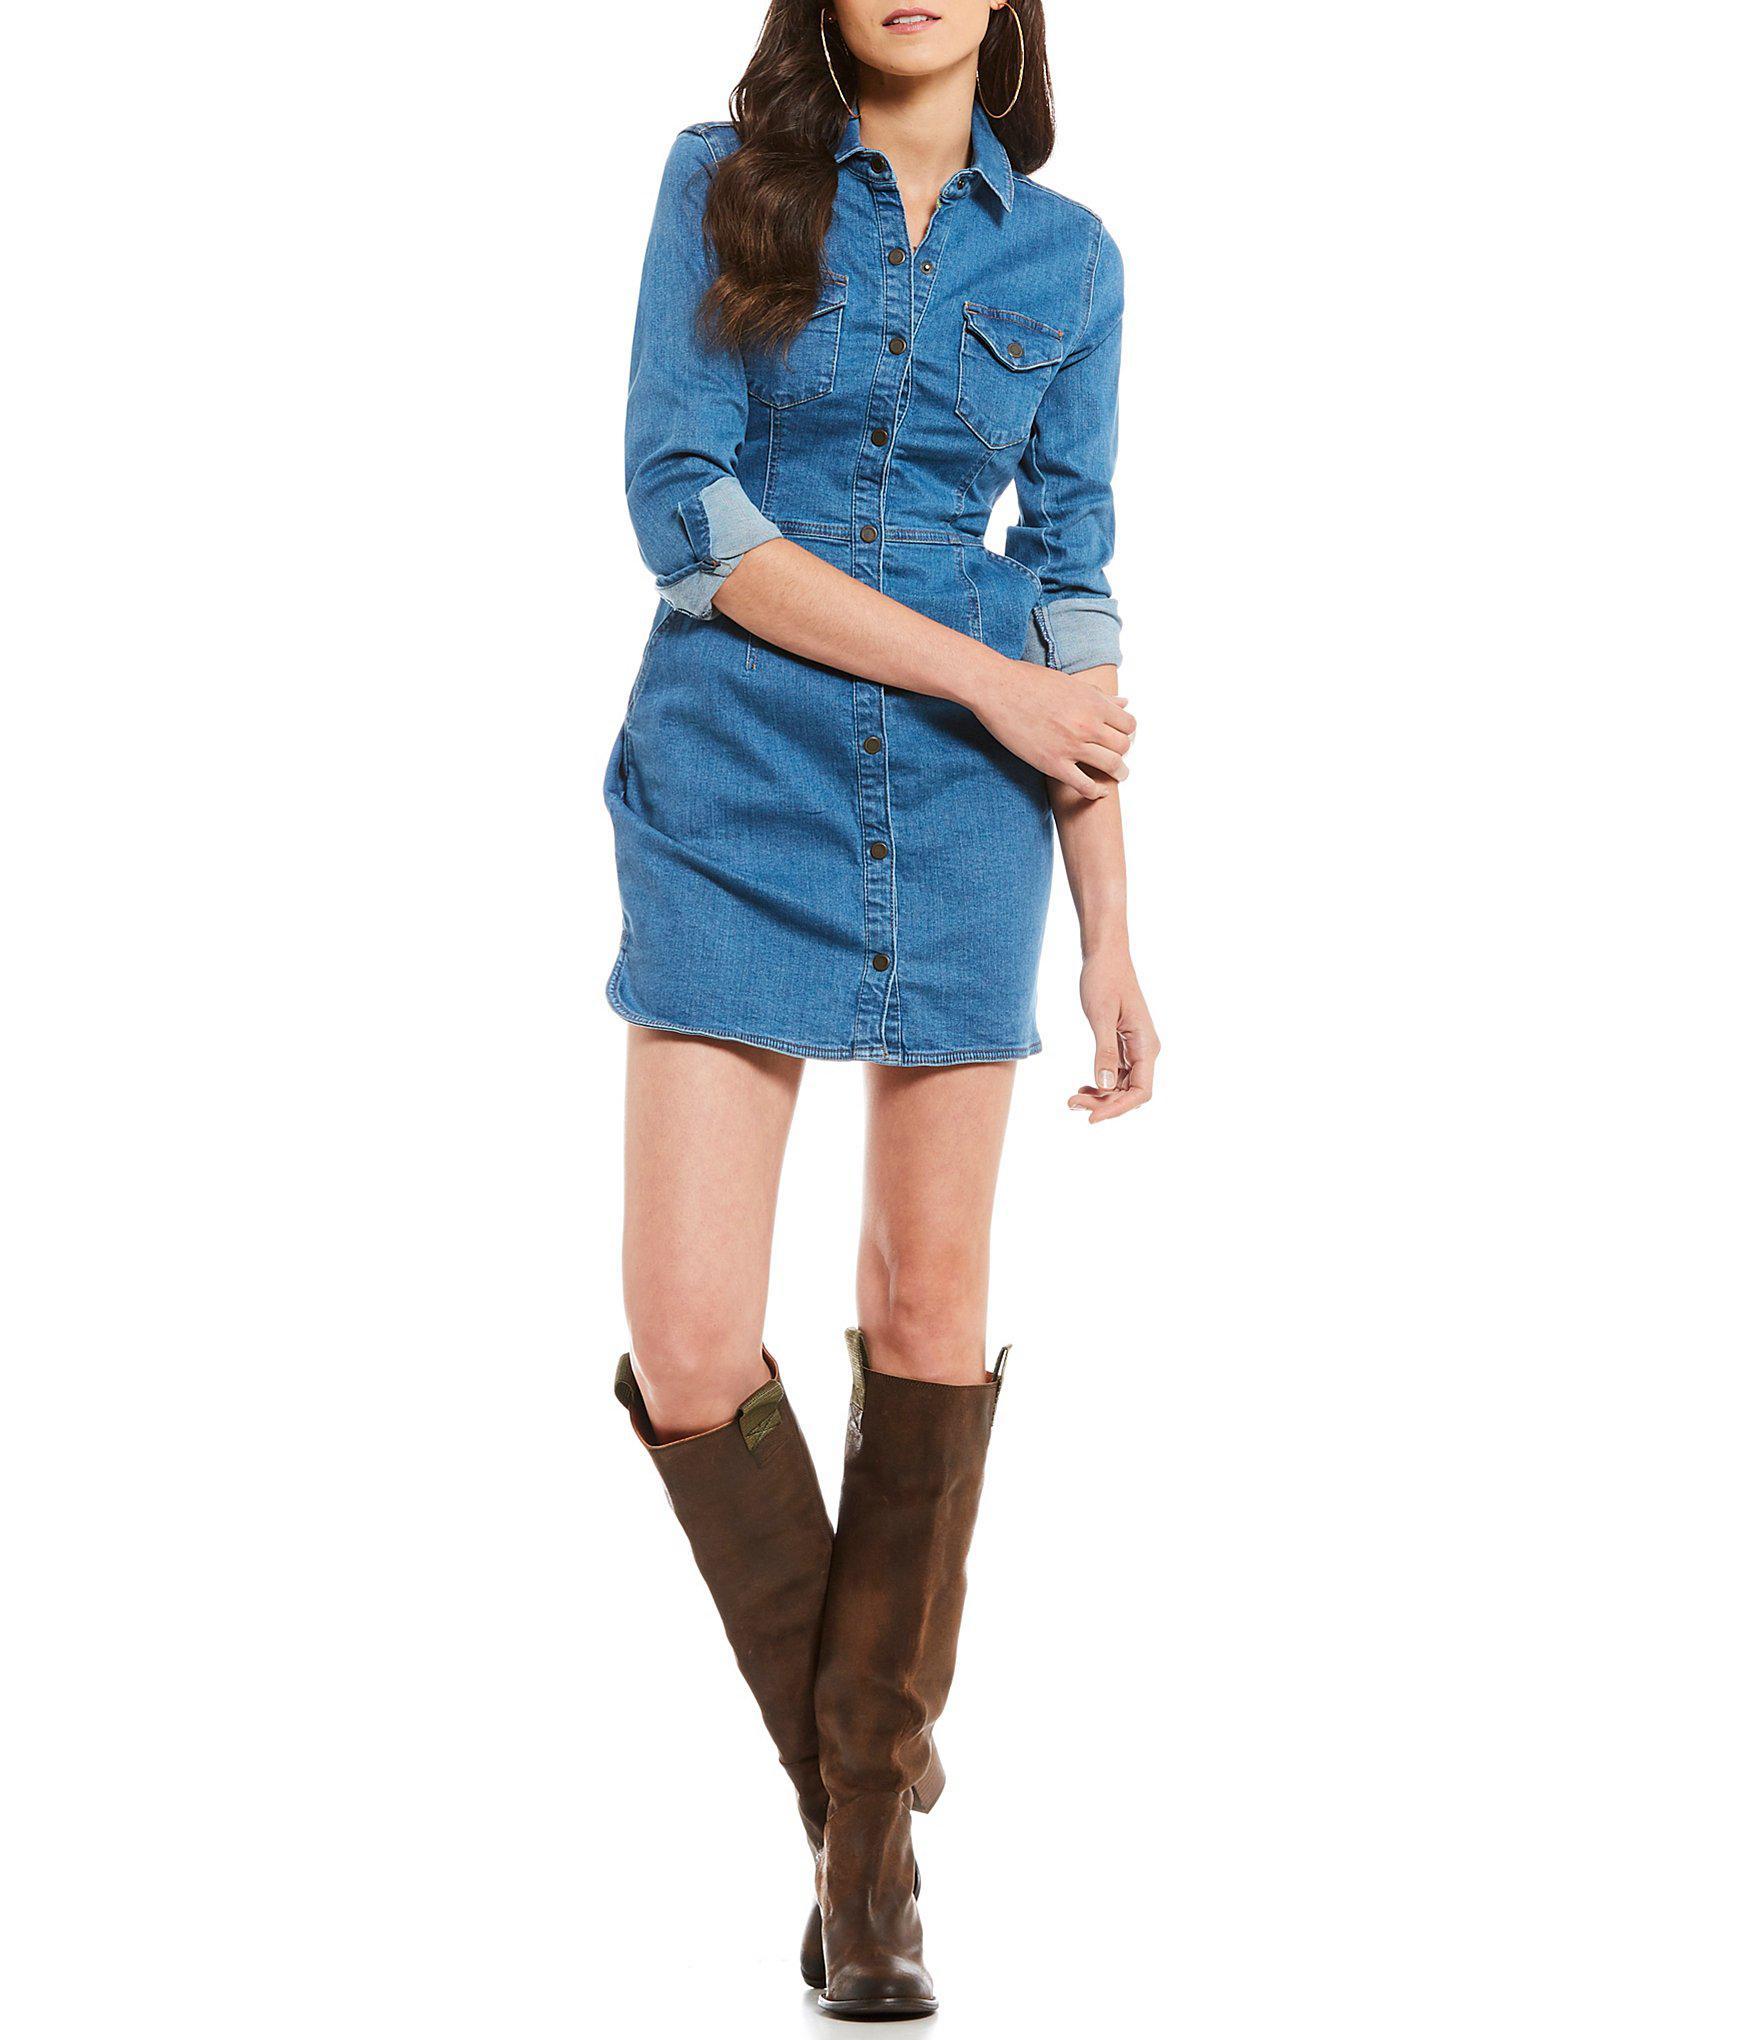 d5371518119 Lyst - Free People Dynomite In Denim Western Inspired Mini Shirt ...